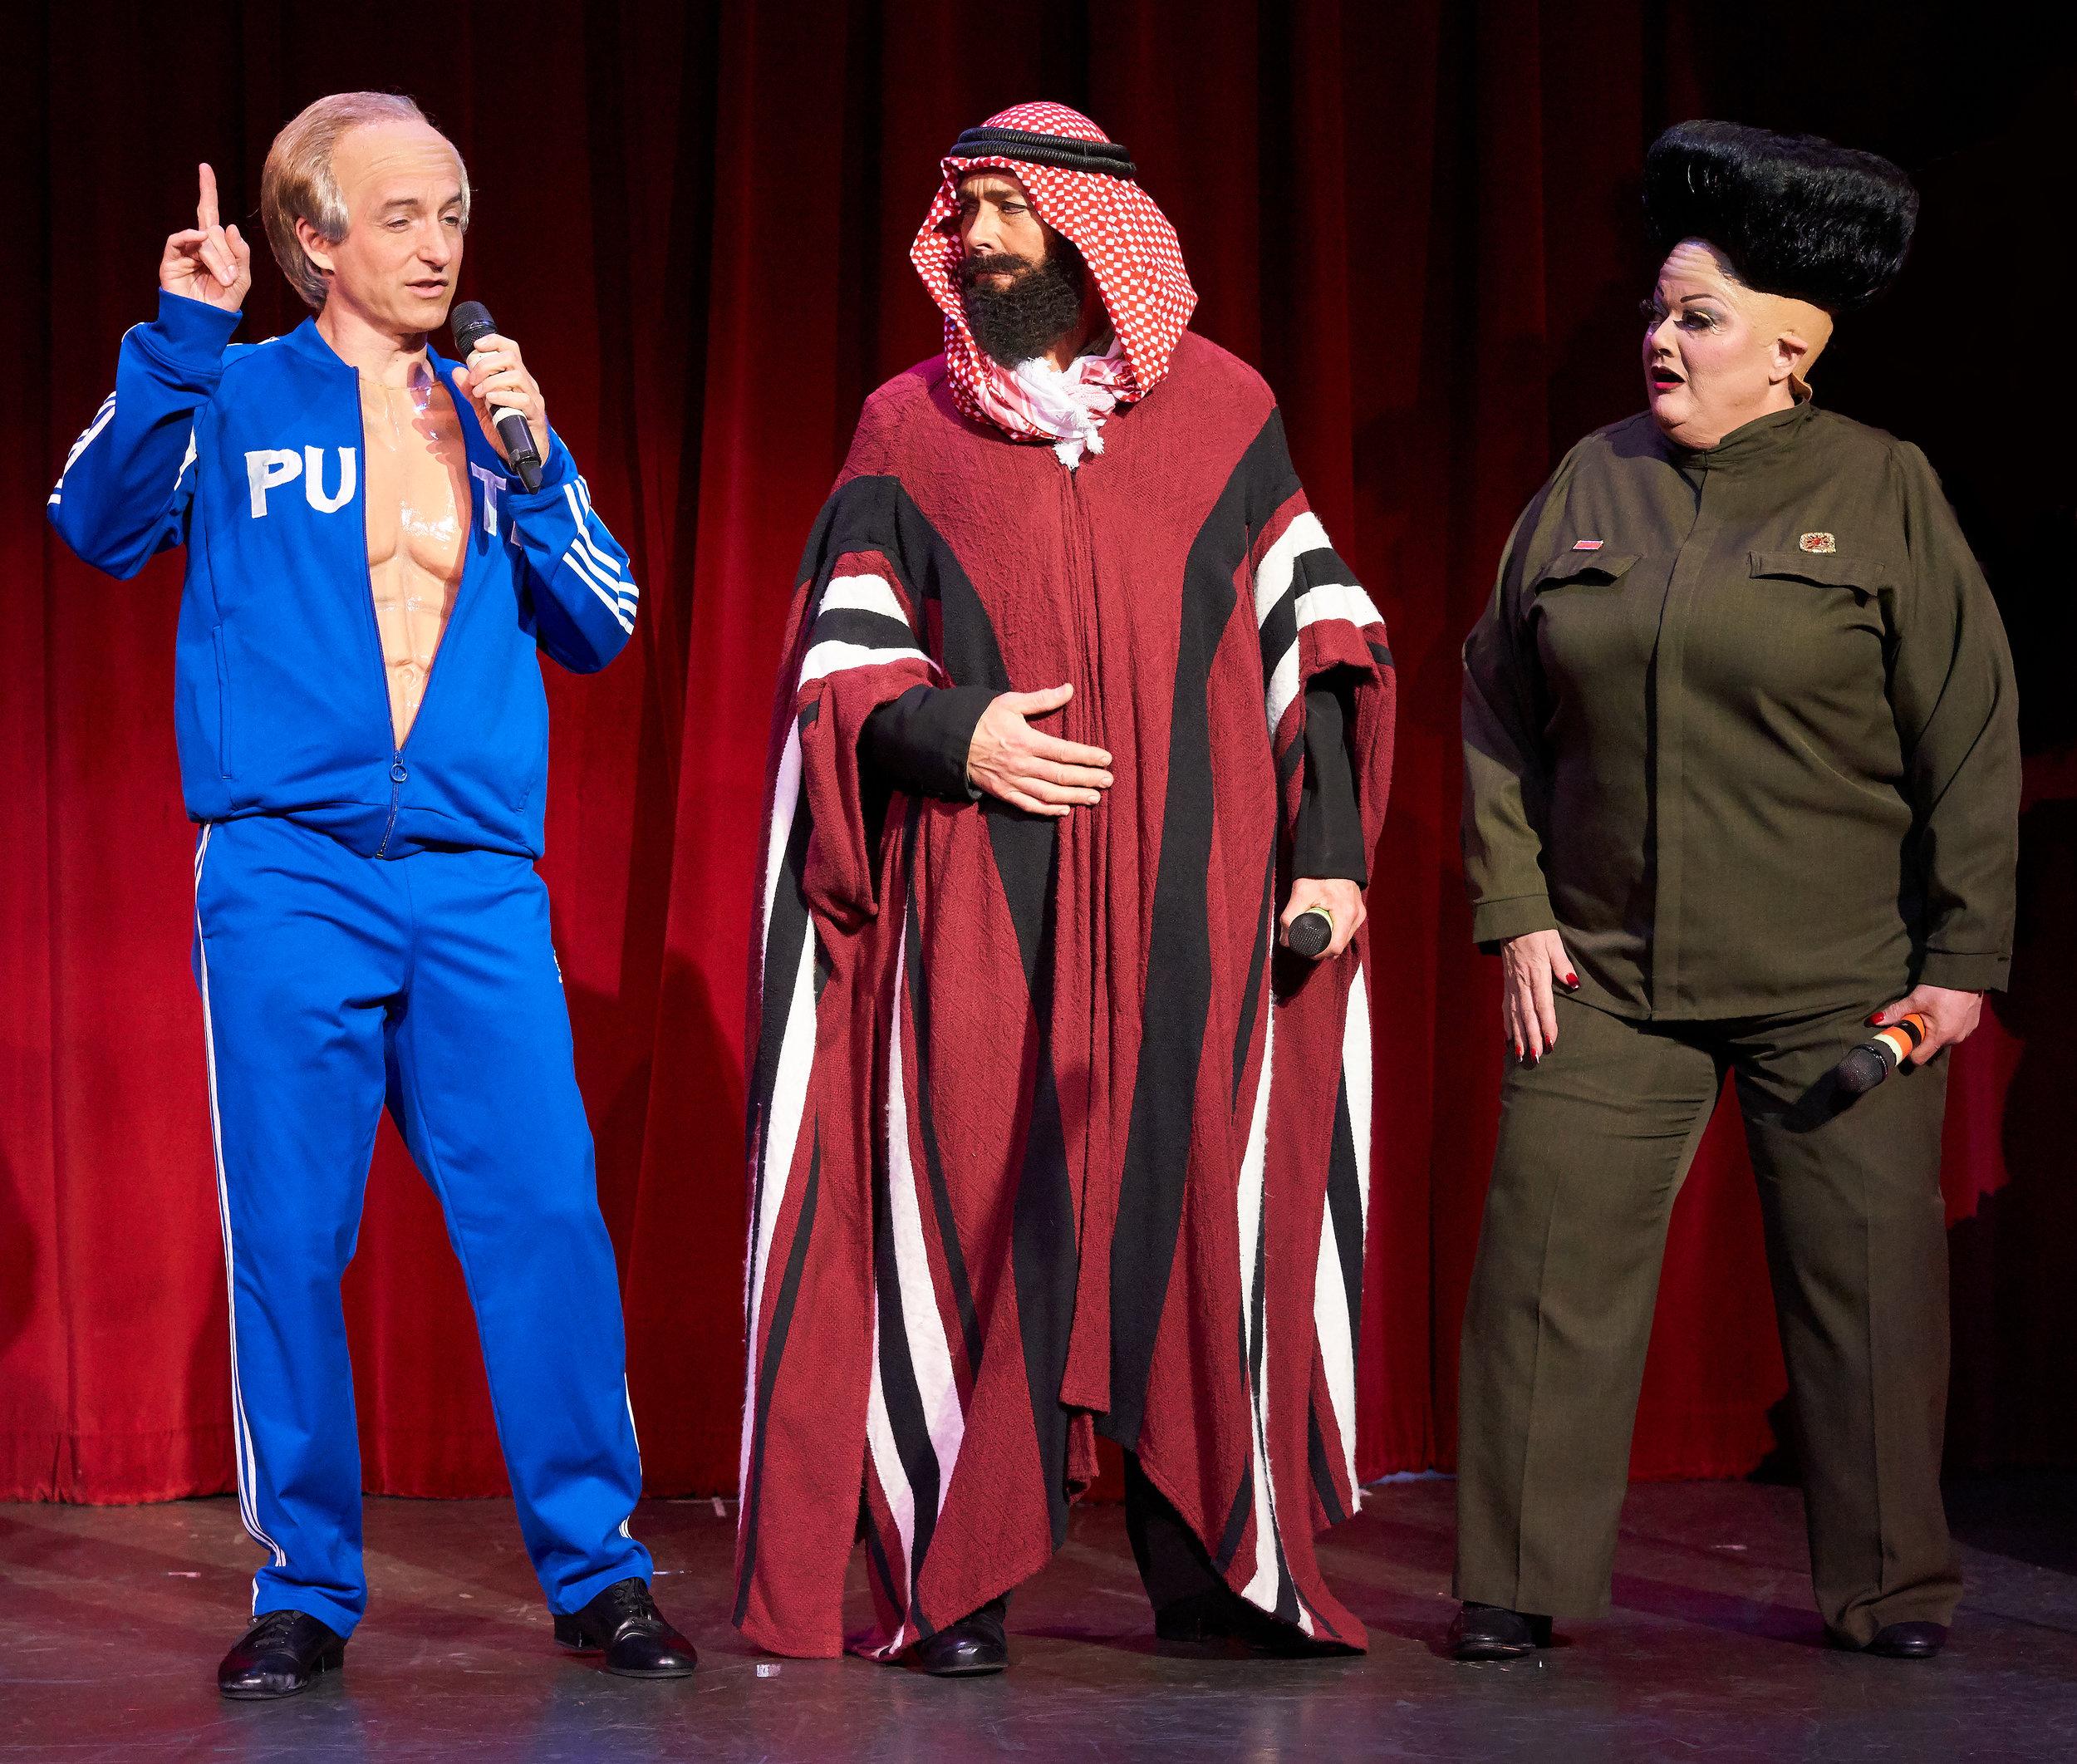 Vladimir Putin, Sheik, Kim Jong-un.jpg